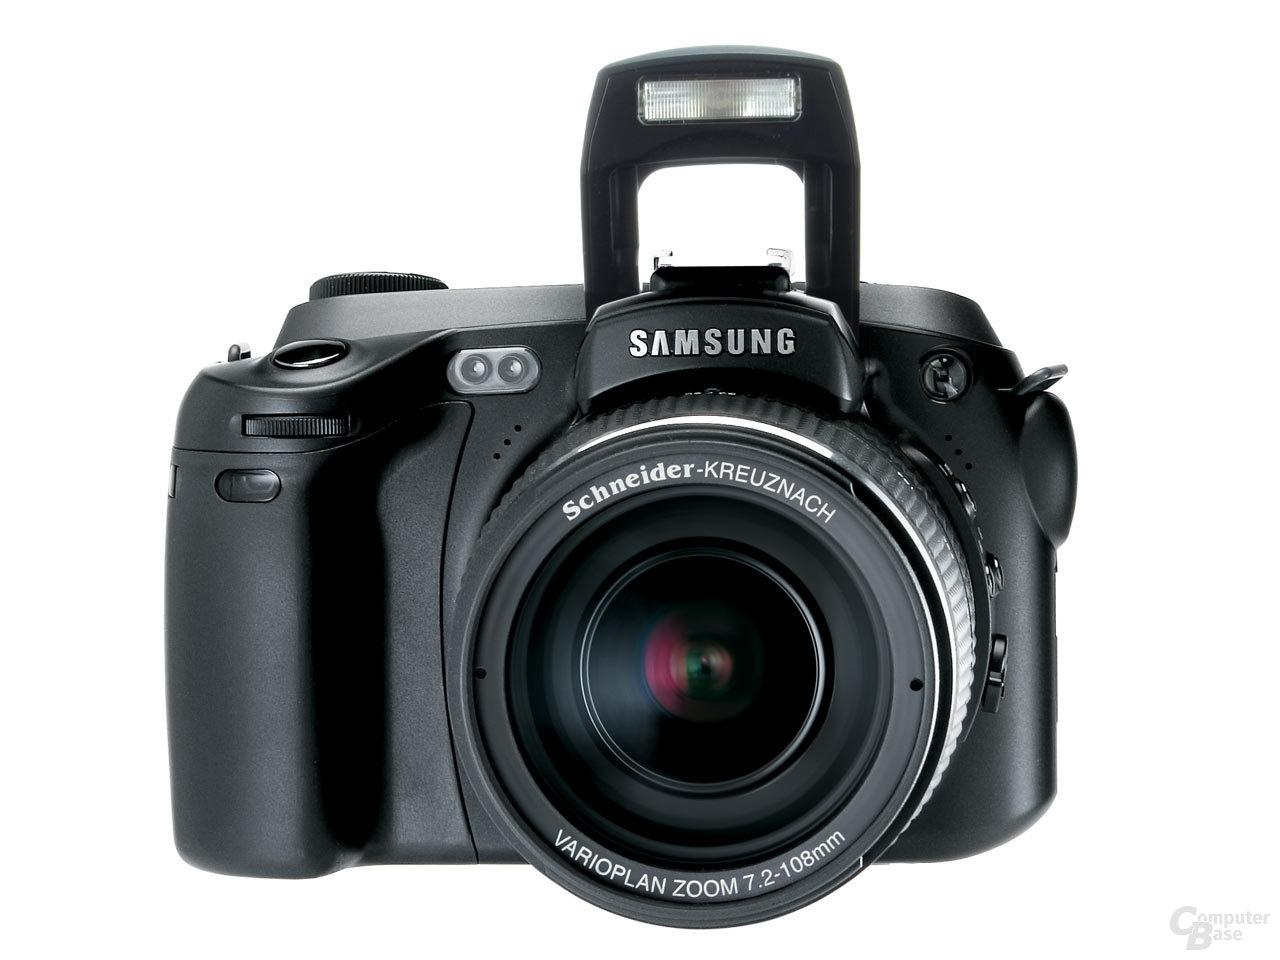 Samsung Digimax Pro 815